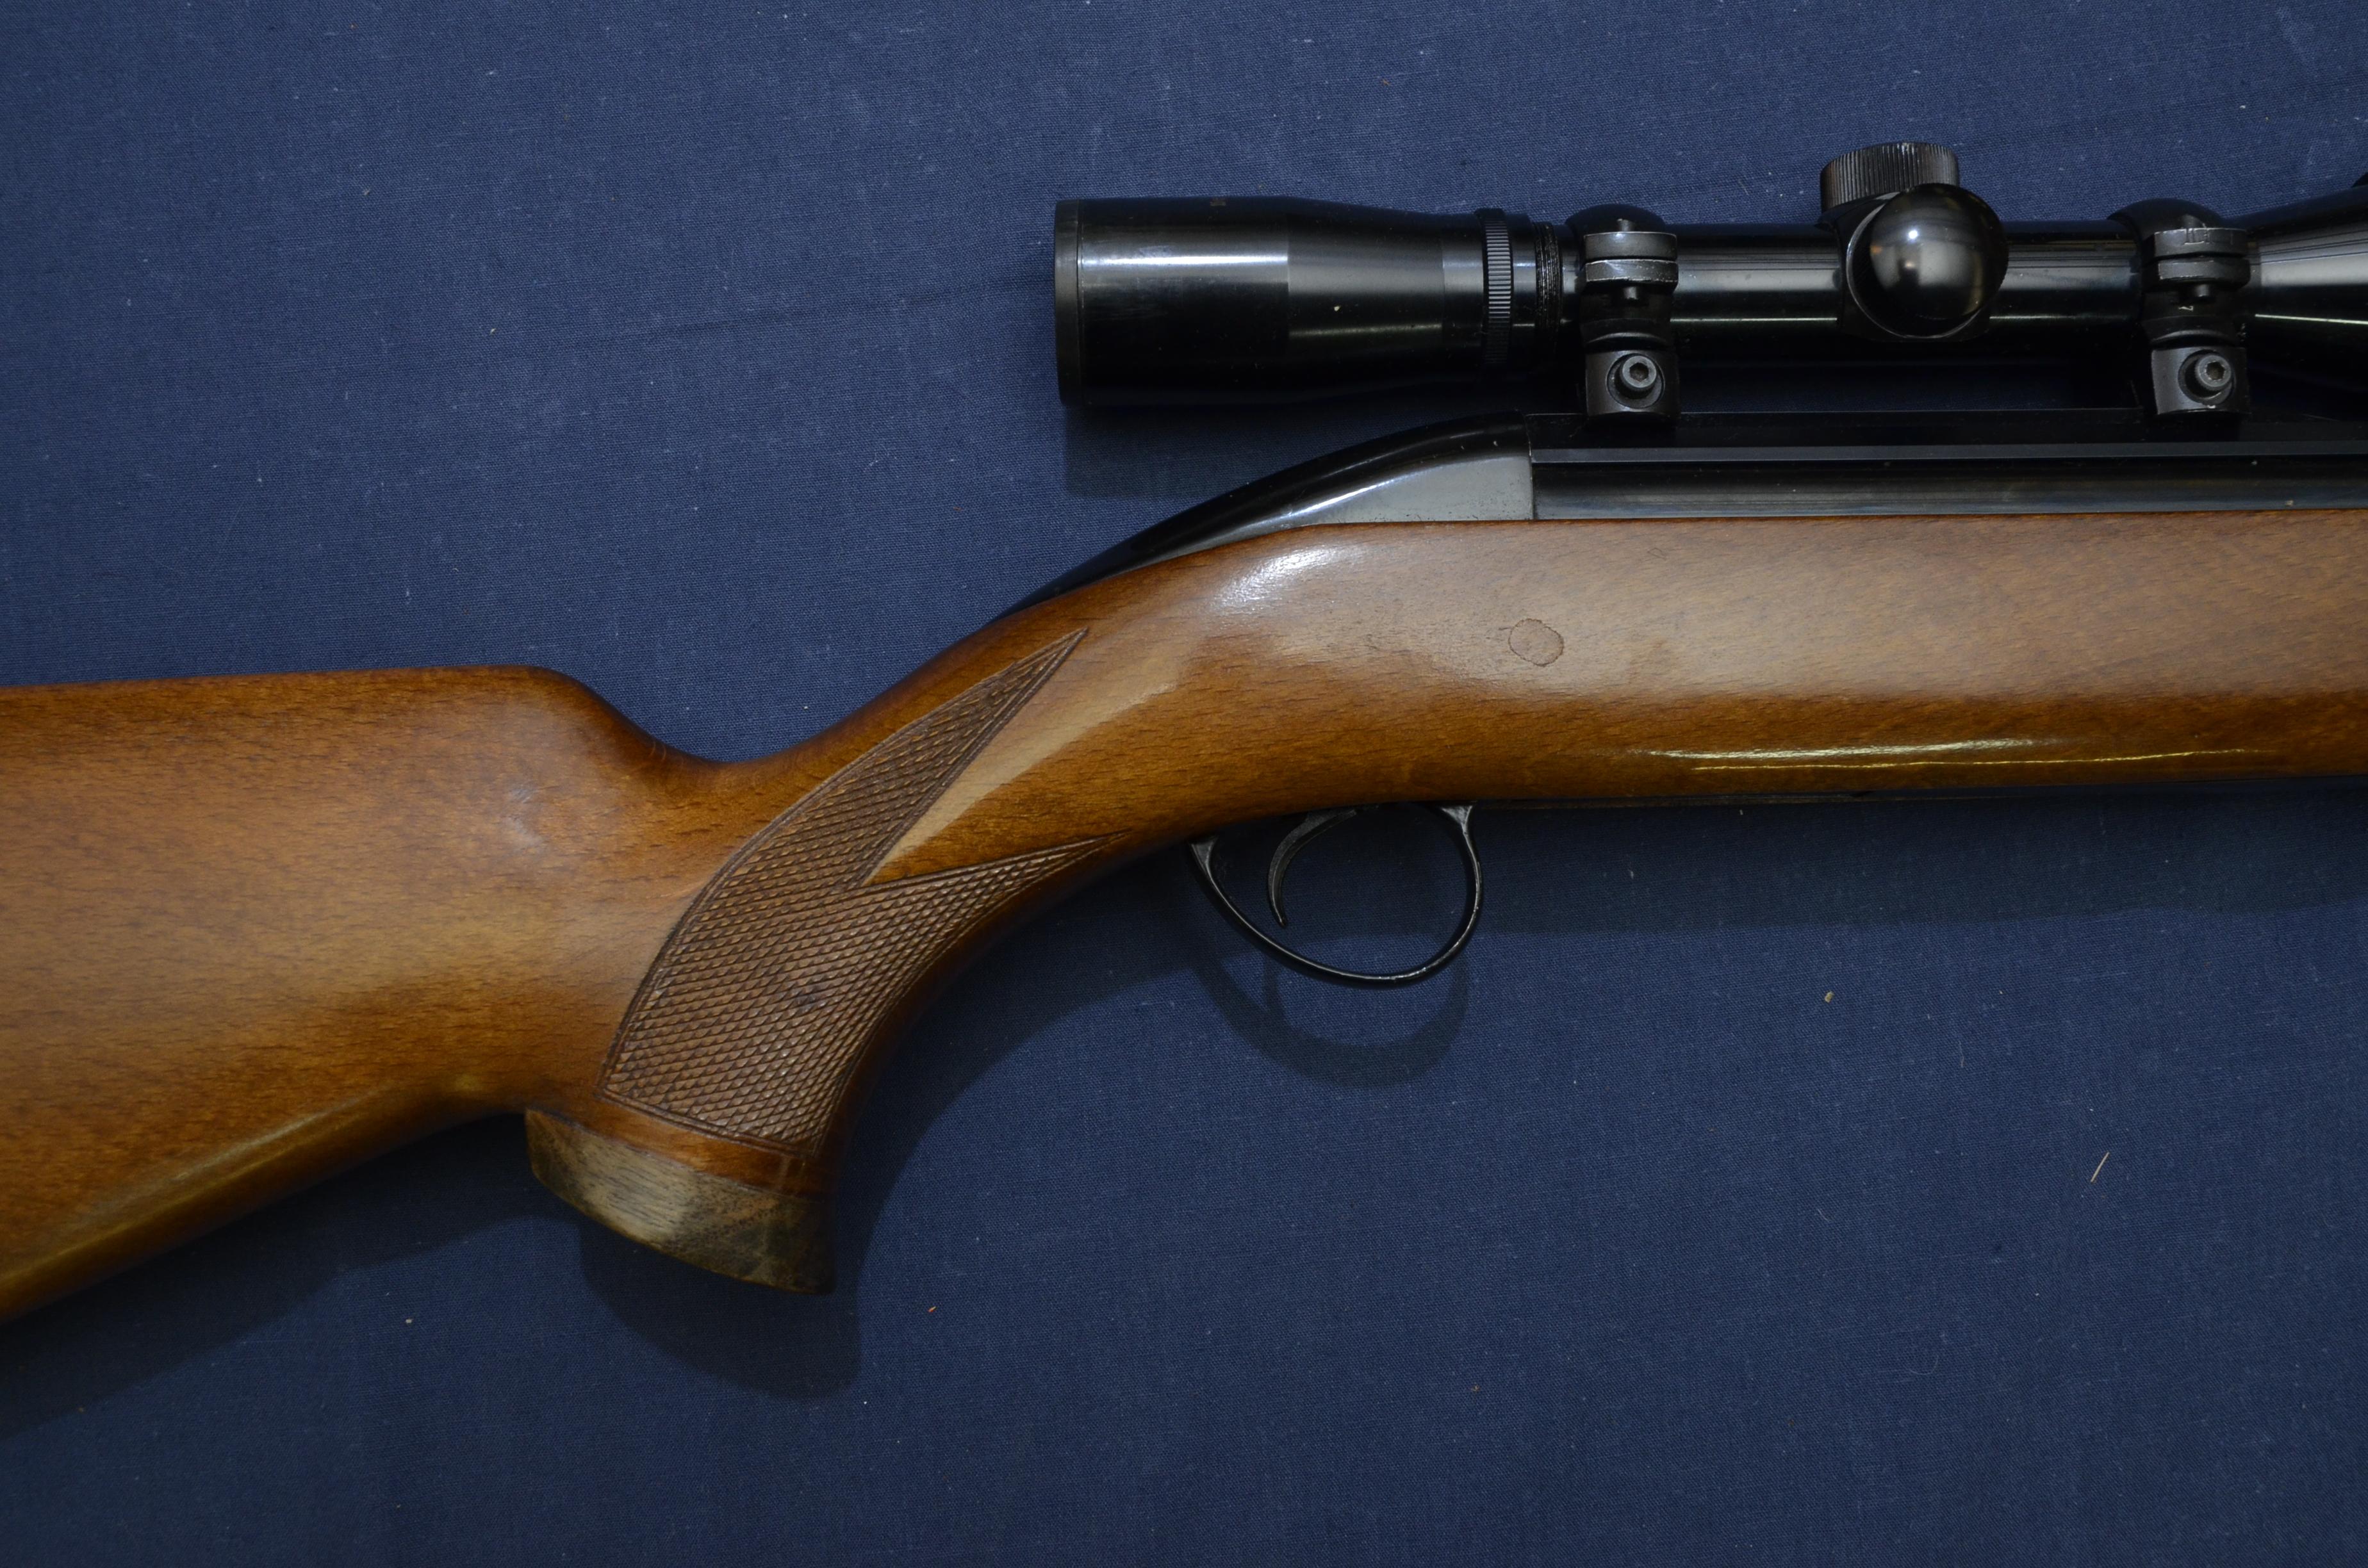 Adult sporter air rifles